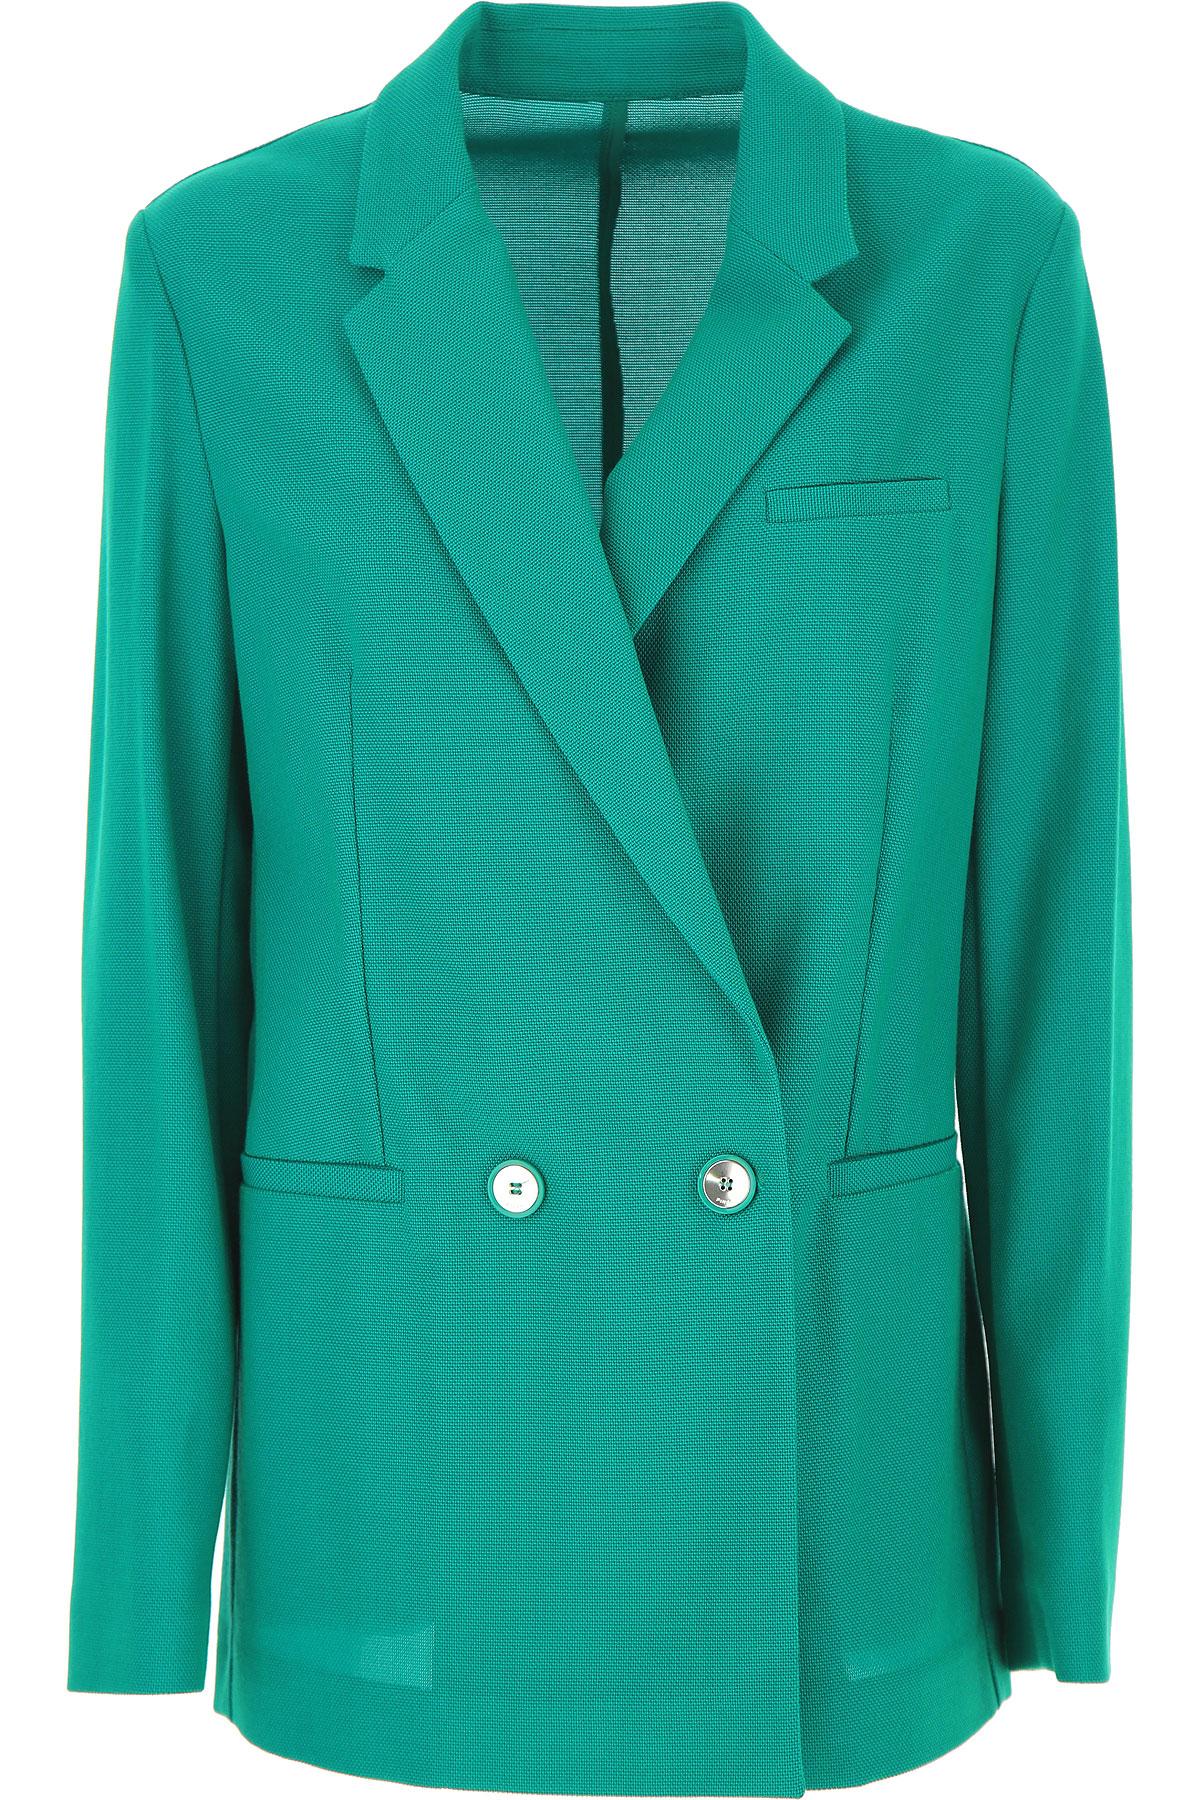 Pinko Blazer for Women On Sale, Emerald, Cotton, 2019, 6 8